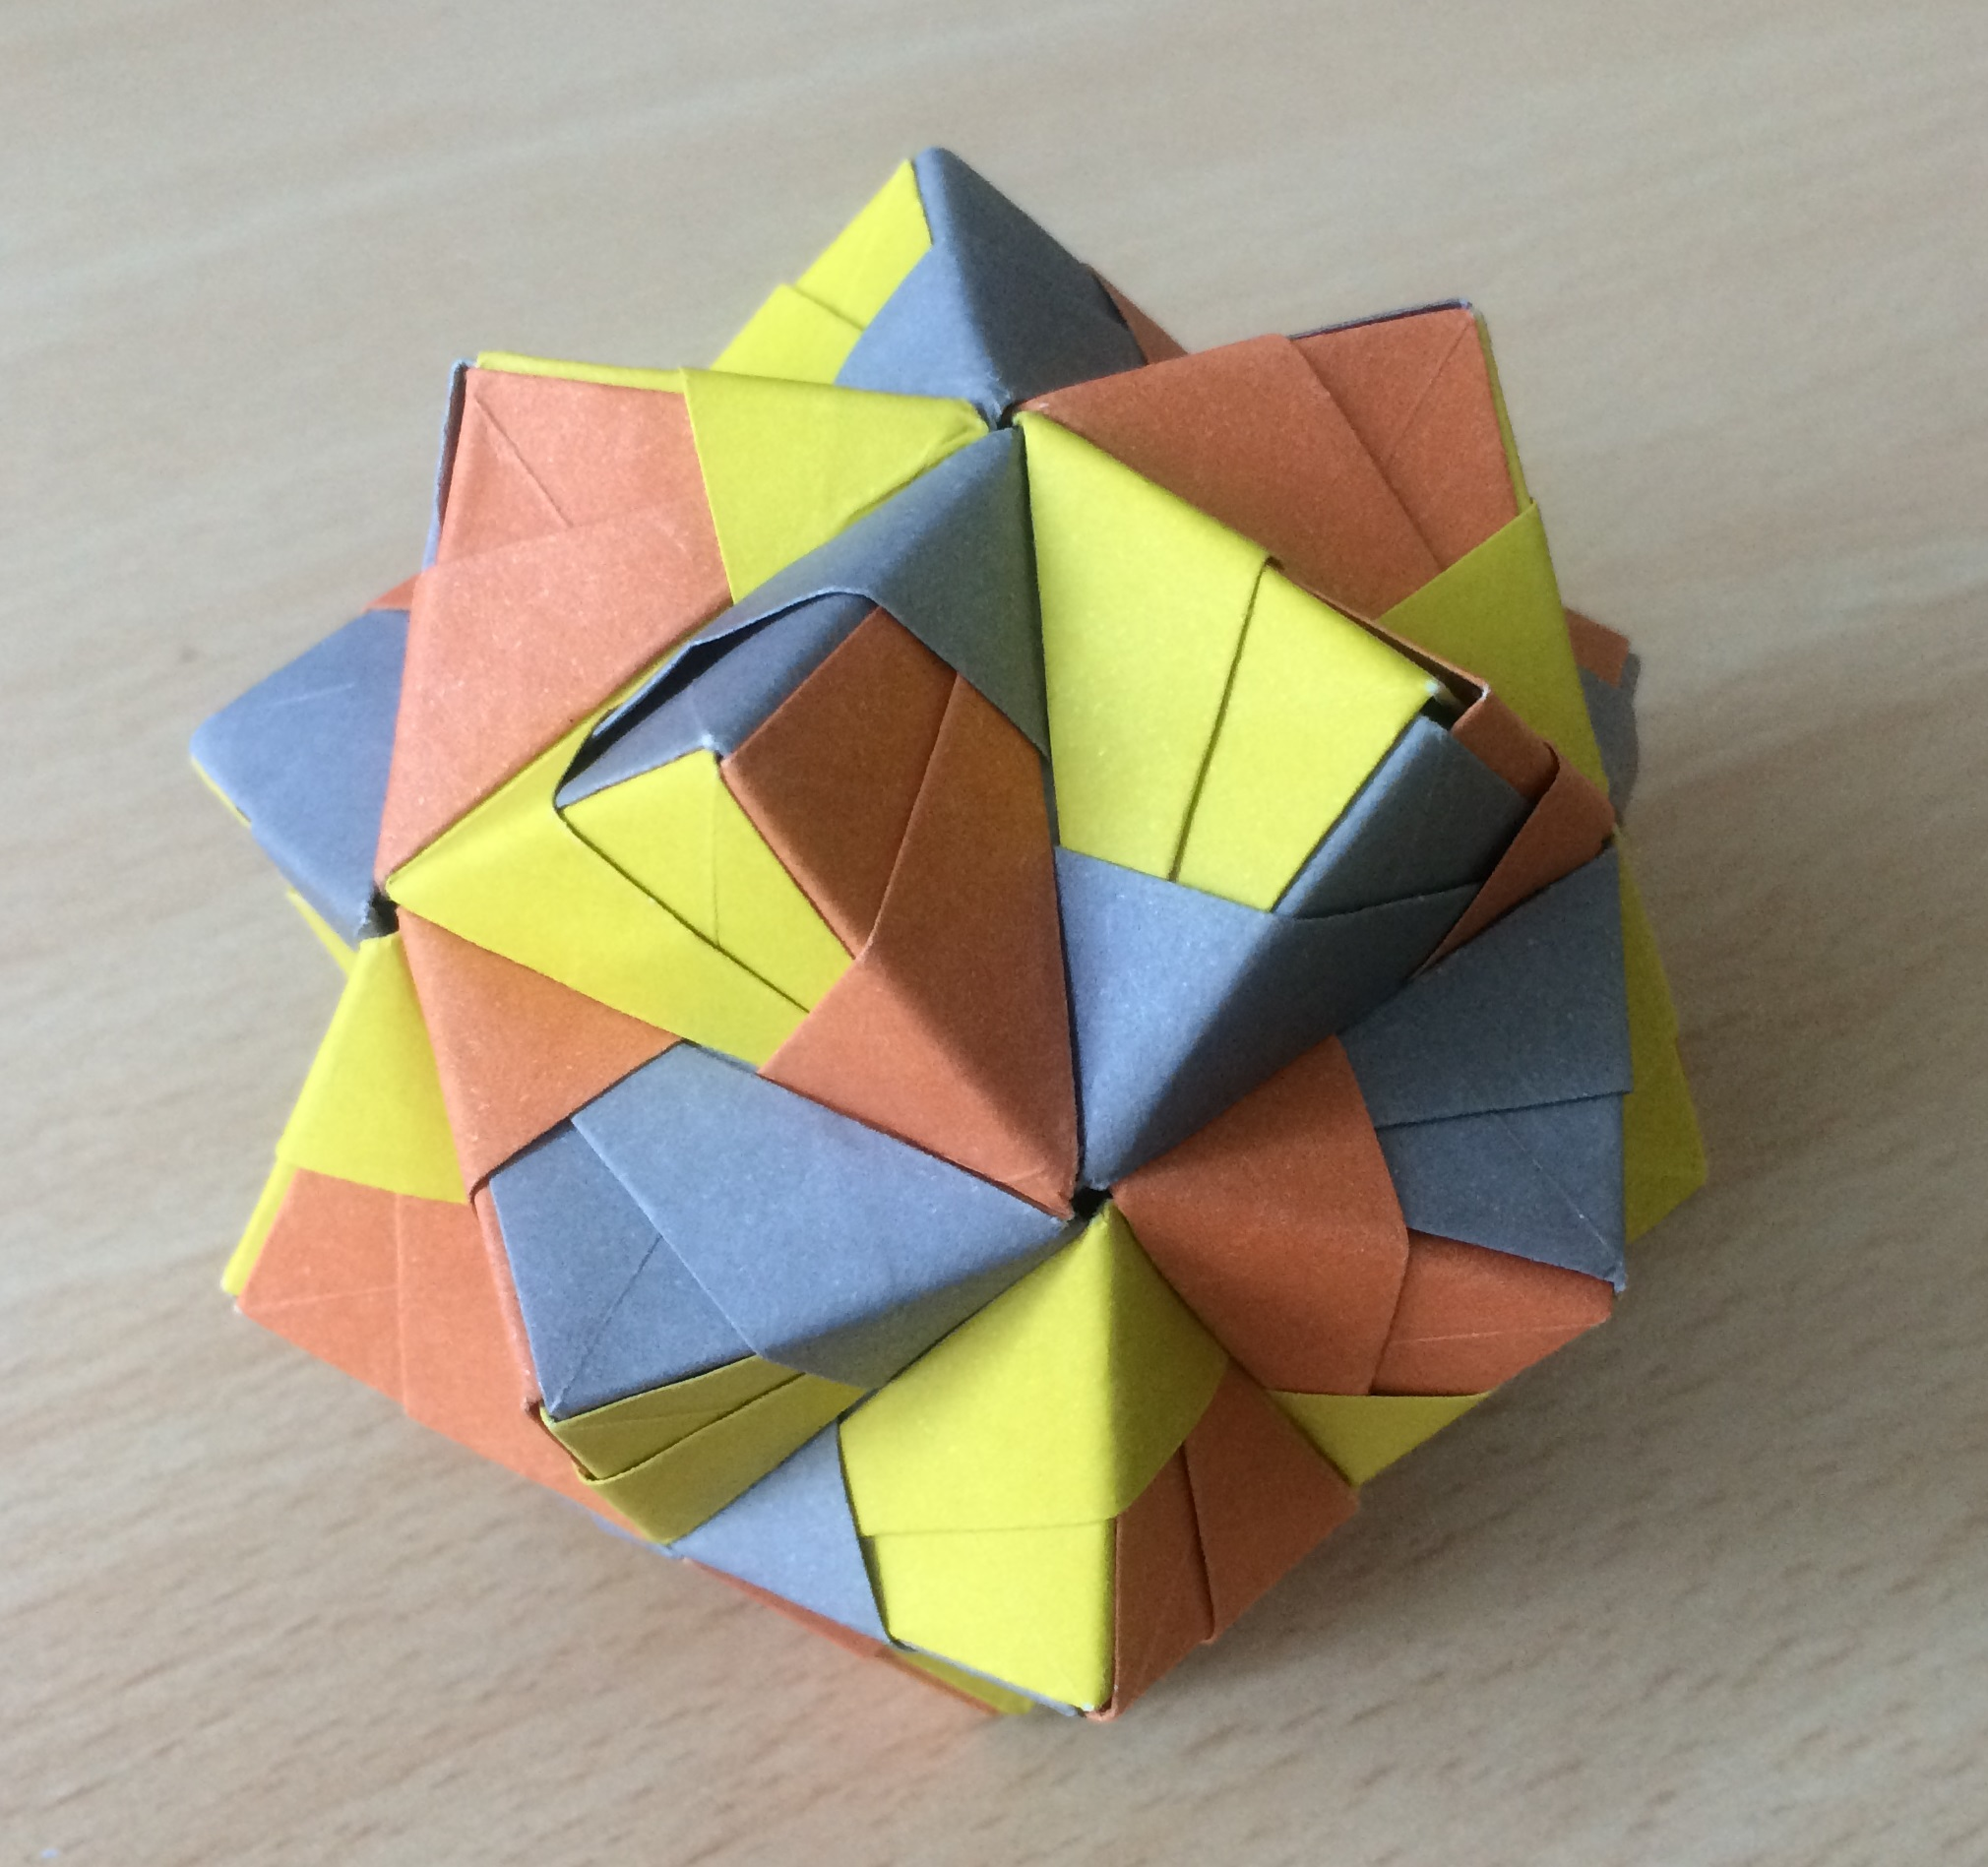 Modular origami polypompholyx cumulated icosahedron sonobe variant cc by sa 30 steve cook mightylinksfo